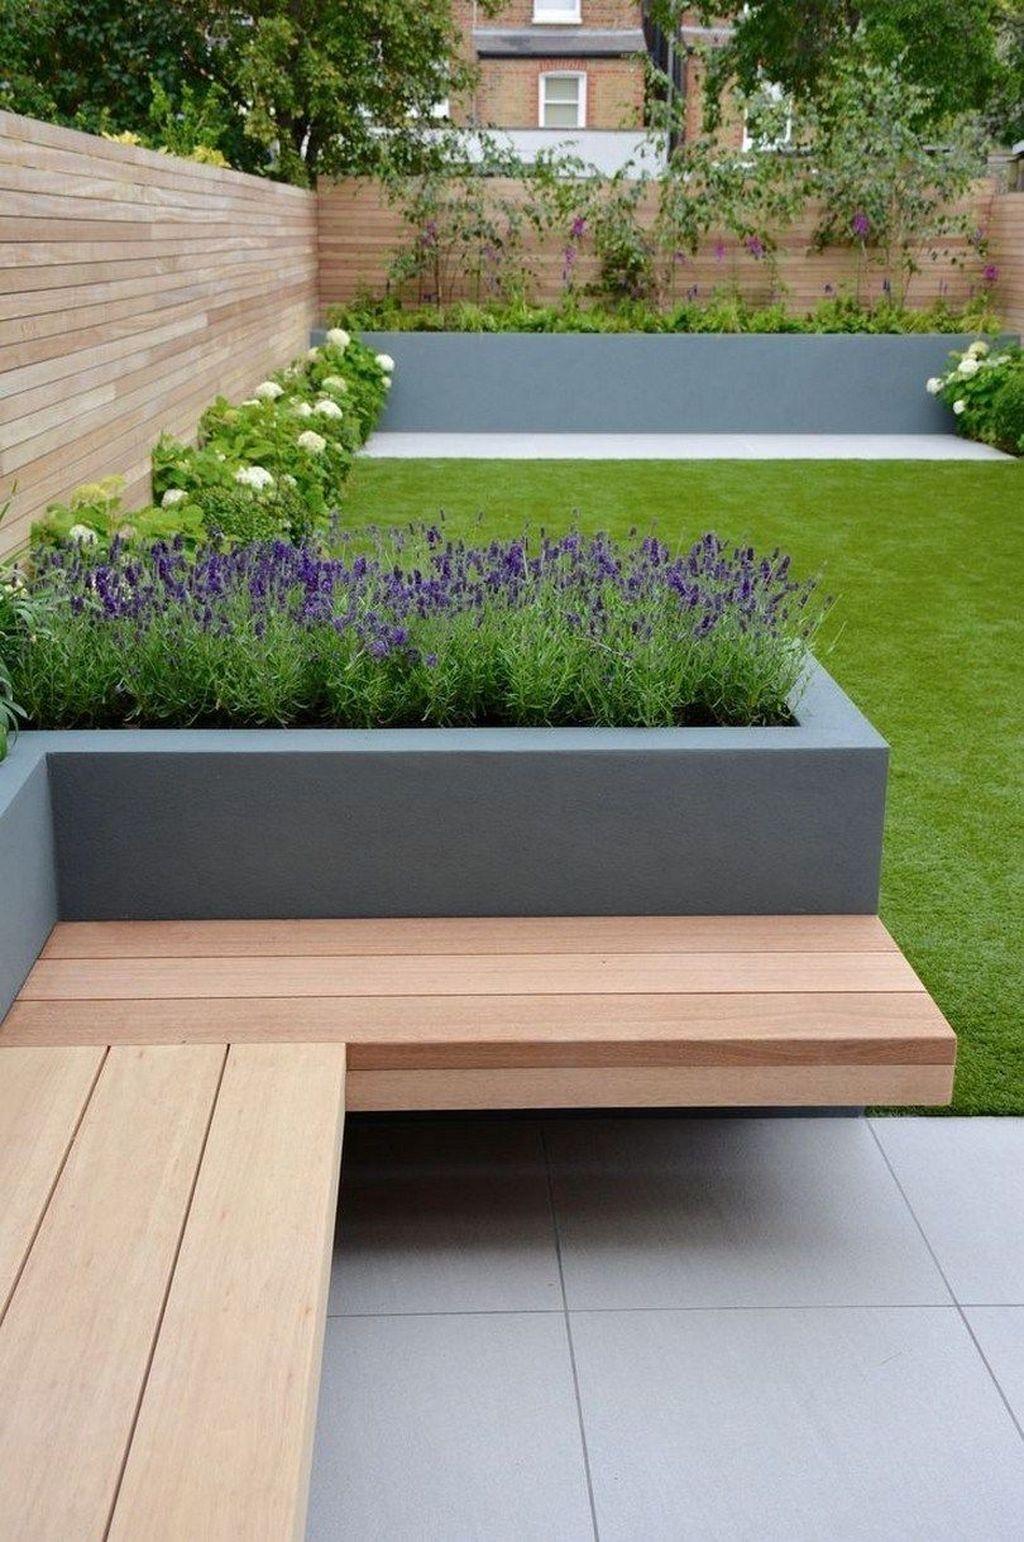 40+ Impressive Backyard Design Ideas You Must Try #moderngardendesign